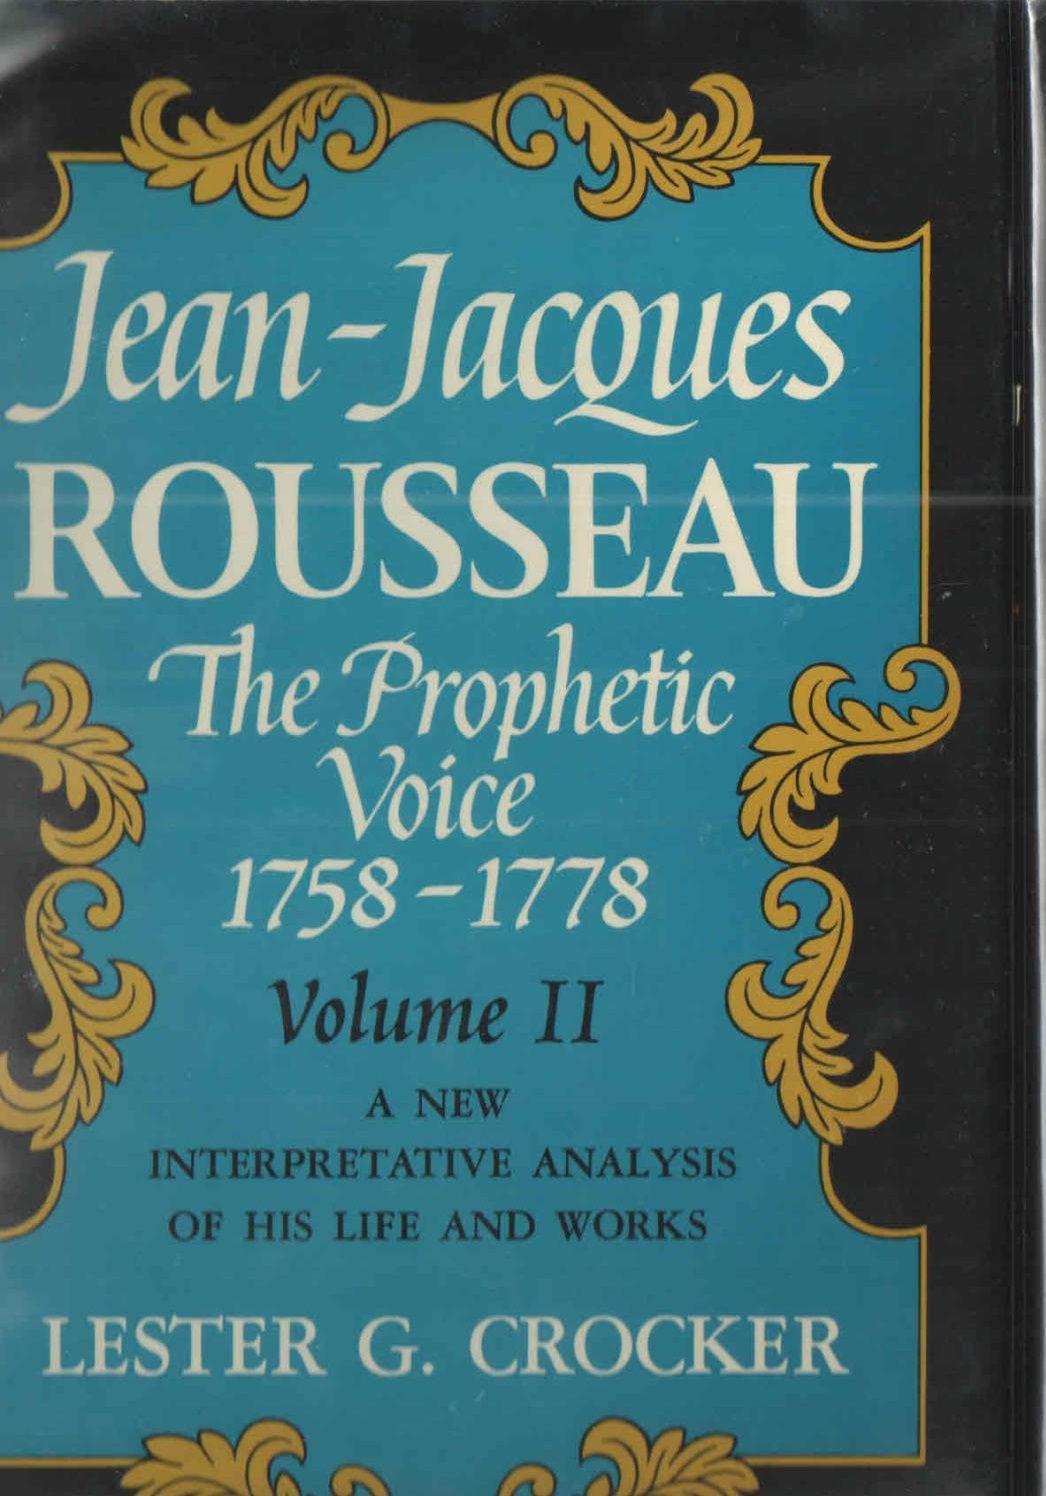 cover of Jean-Jacques Rousseau The Prophetic Voice, Vol. II by Lester G Crocker